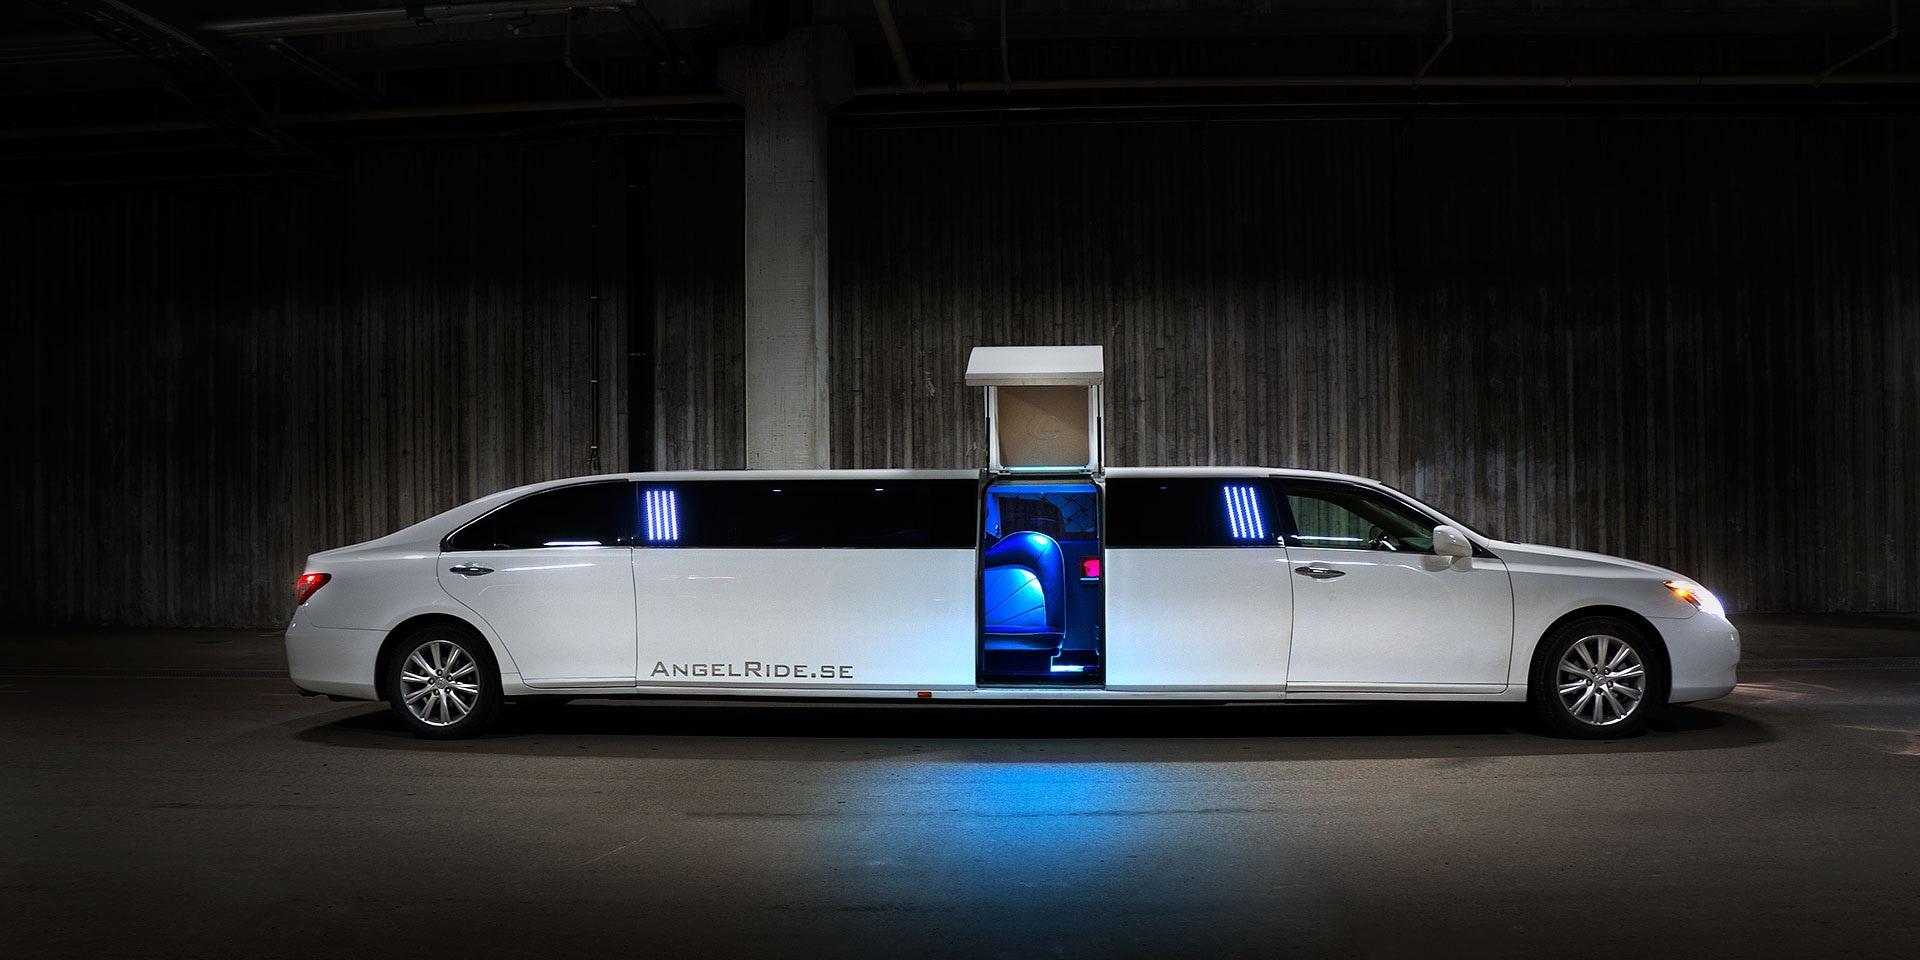 white limousine image Peakpx 1920x960